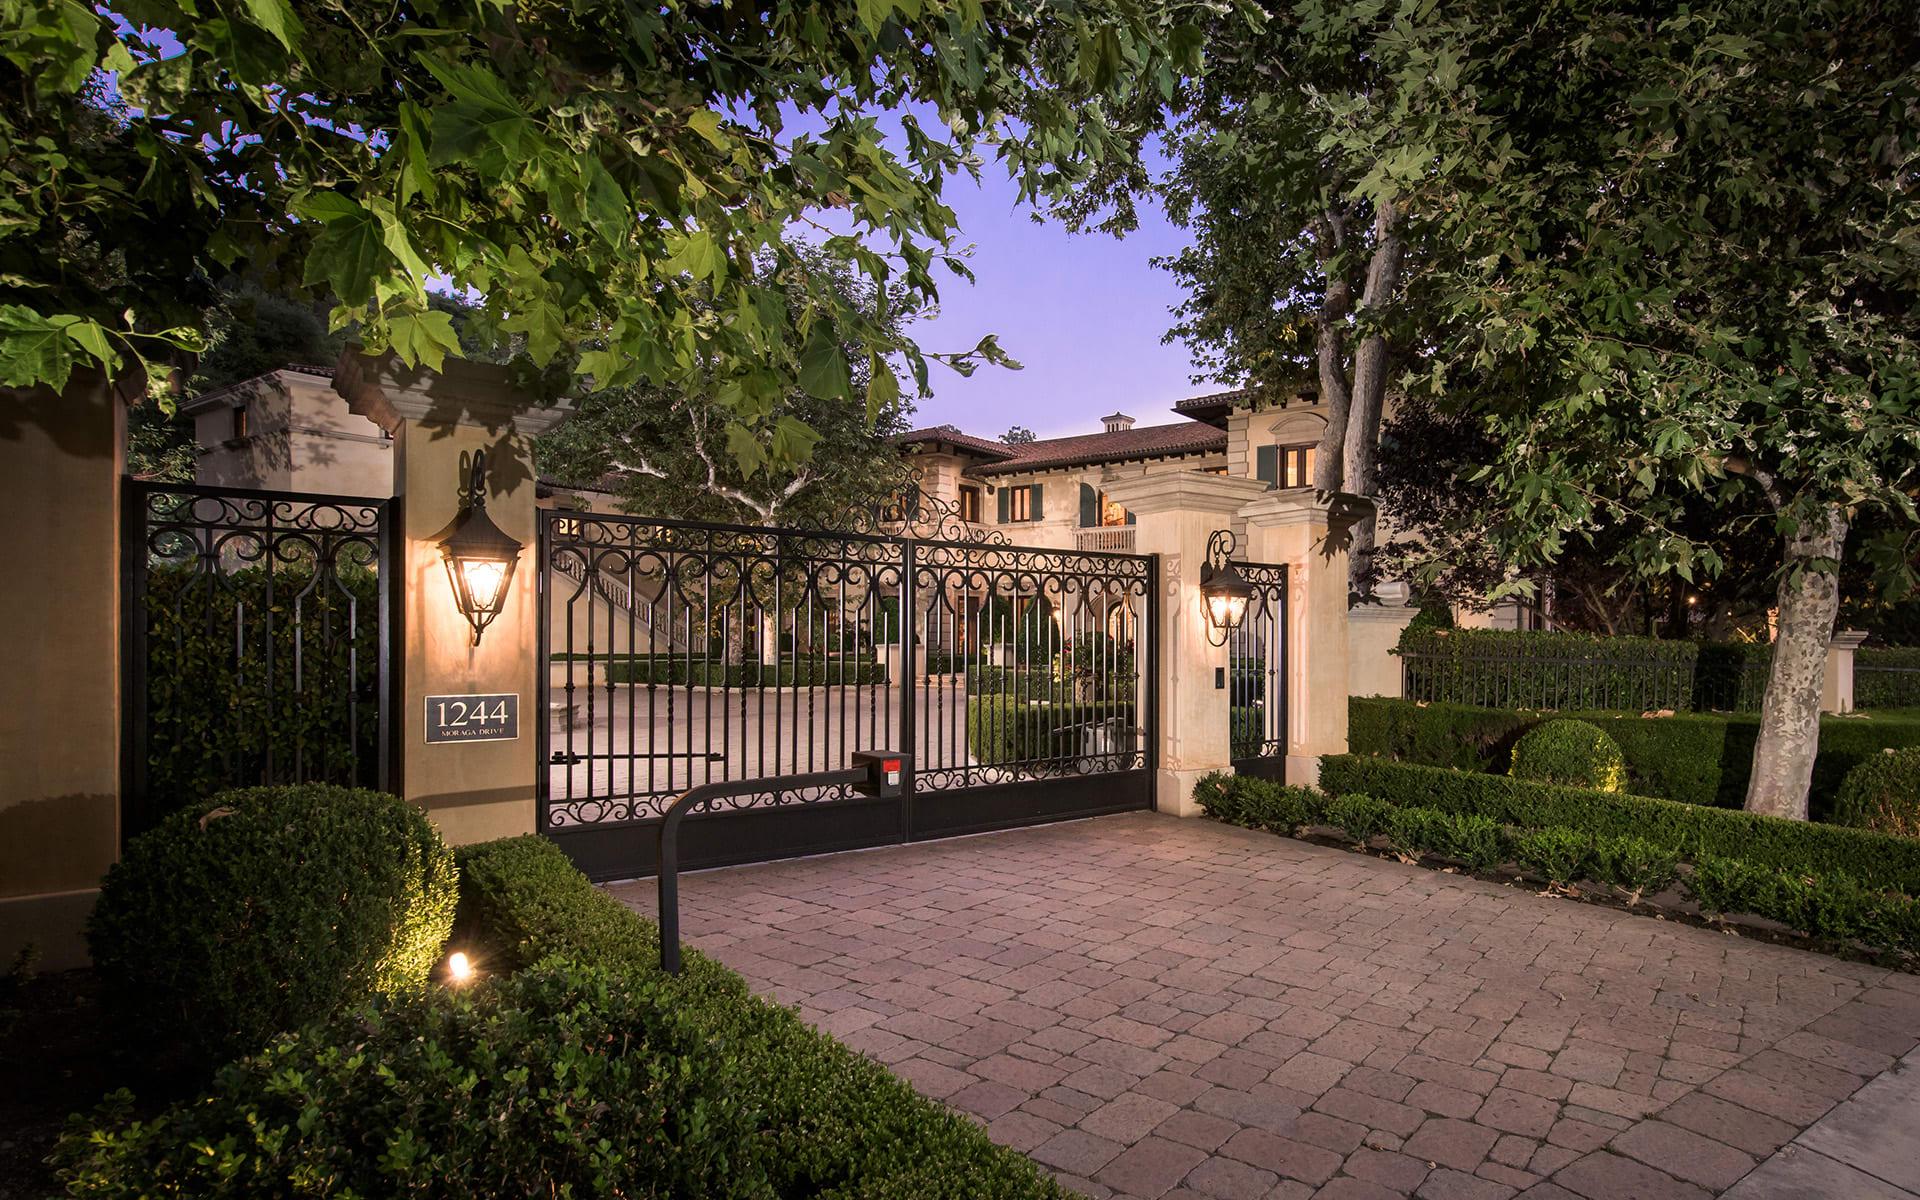 1244 Moraga Drive A Luxury Home For Sale In Los Angeles Los